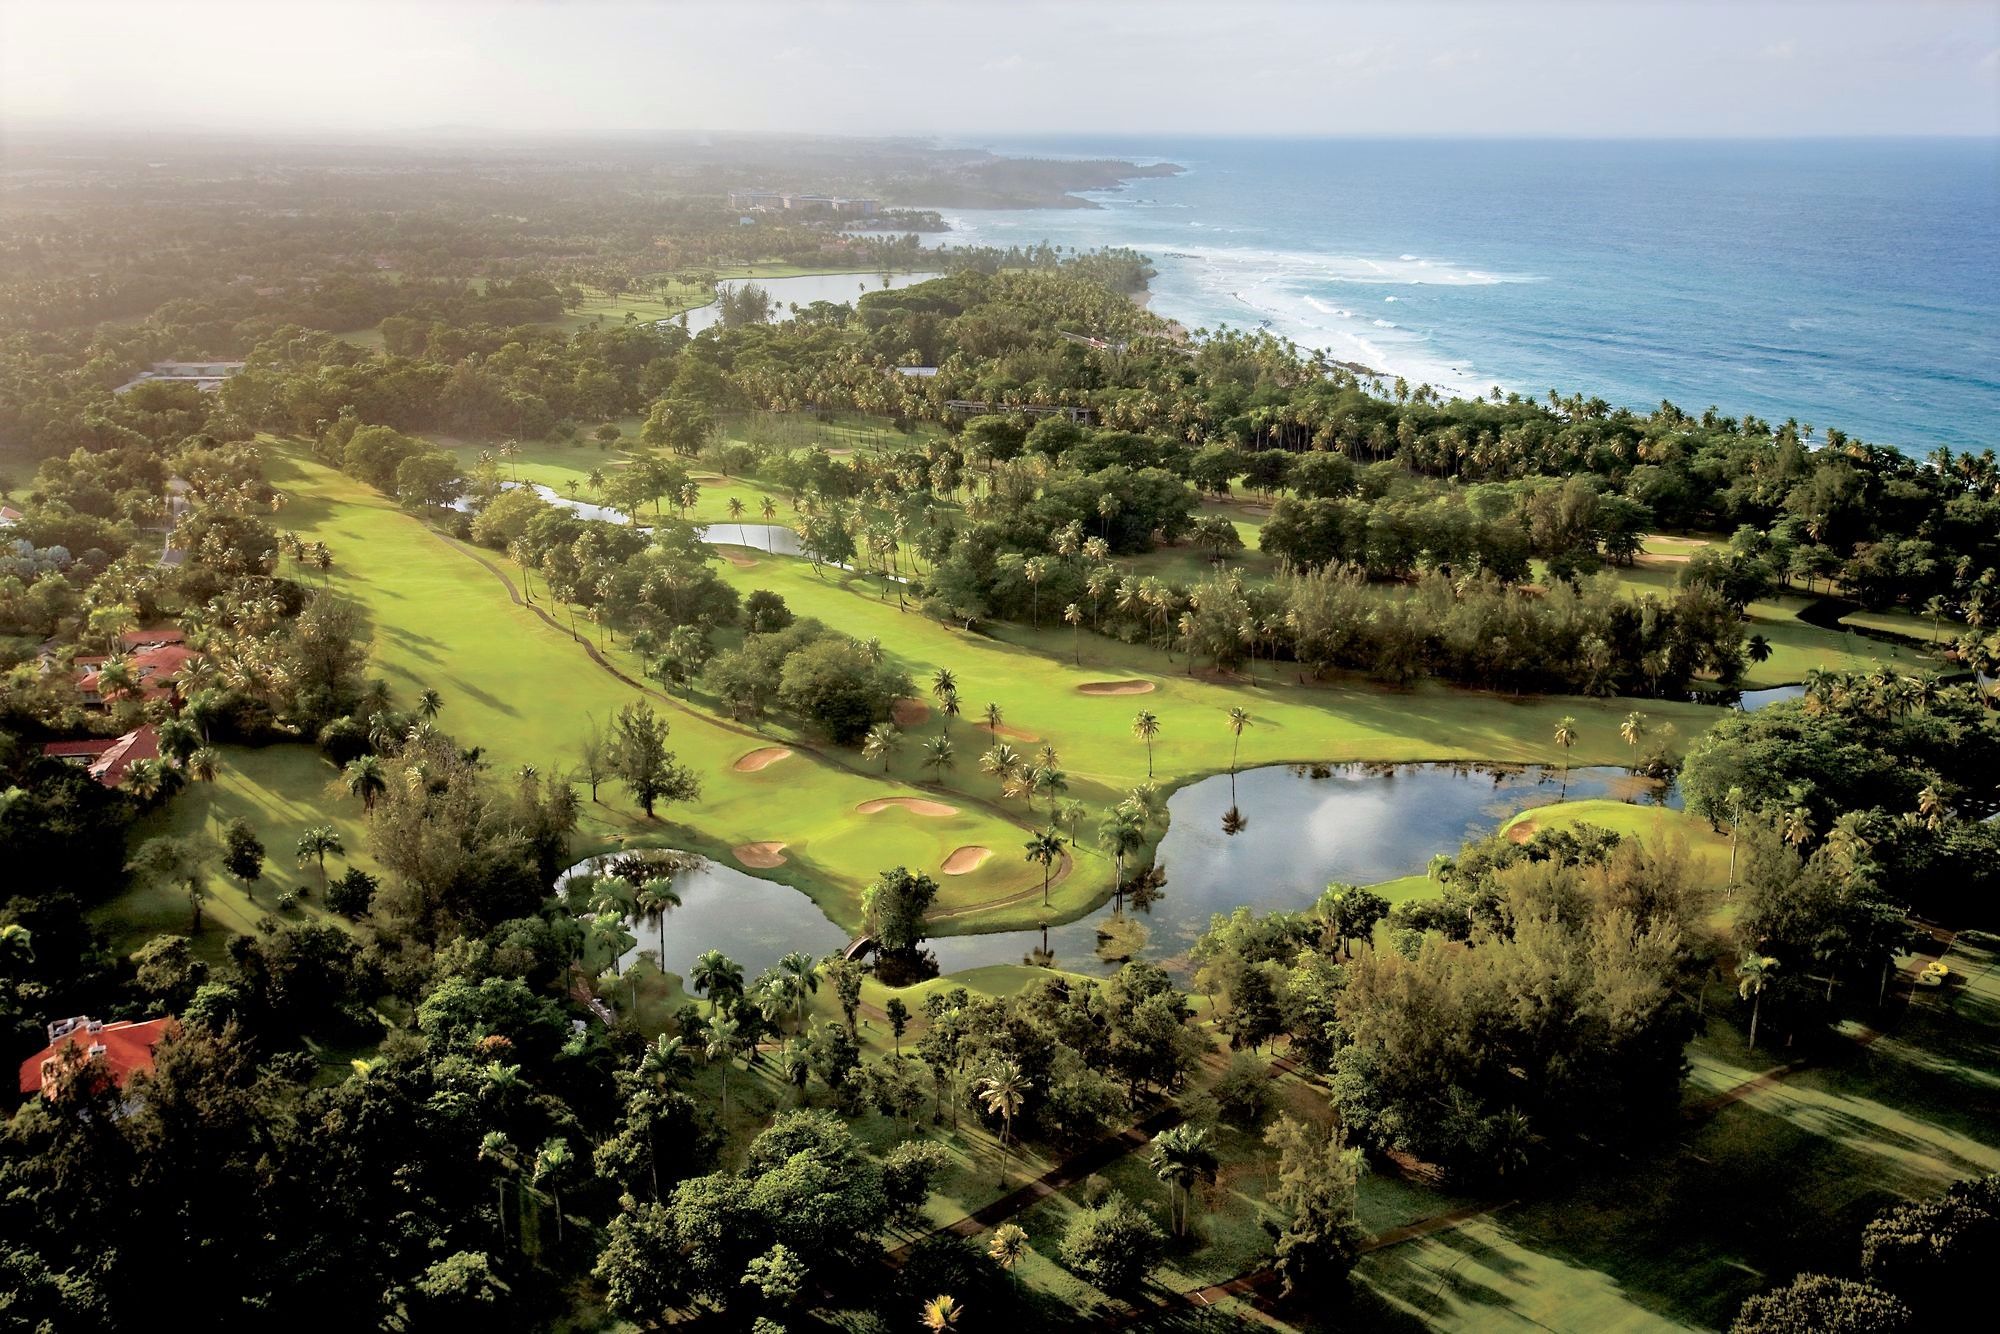 Golf and Spa Resort of the Week: Dorado Beach